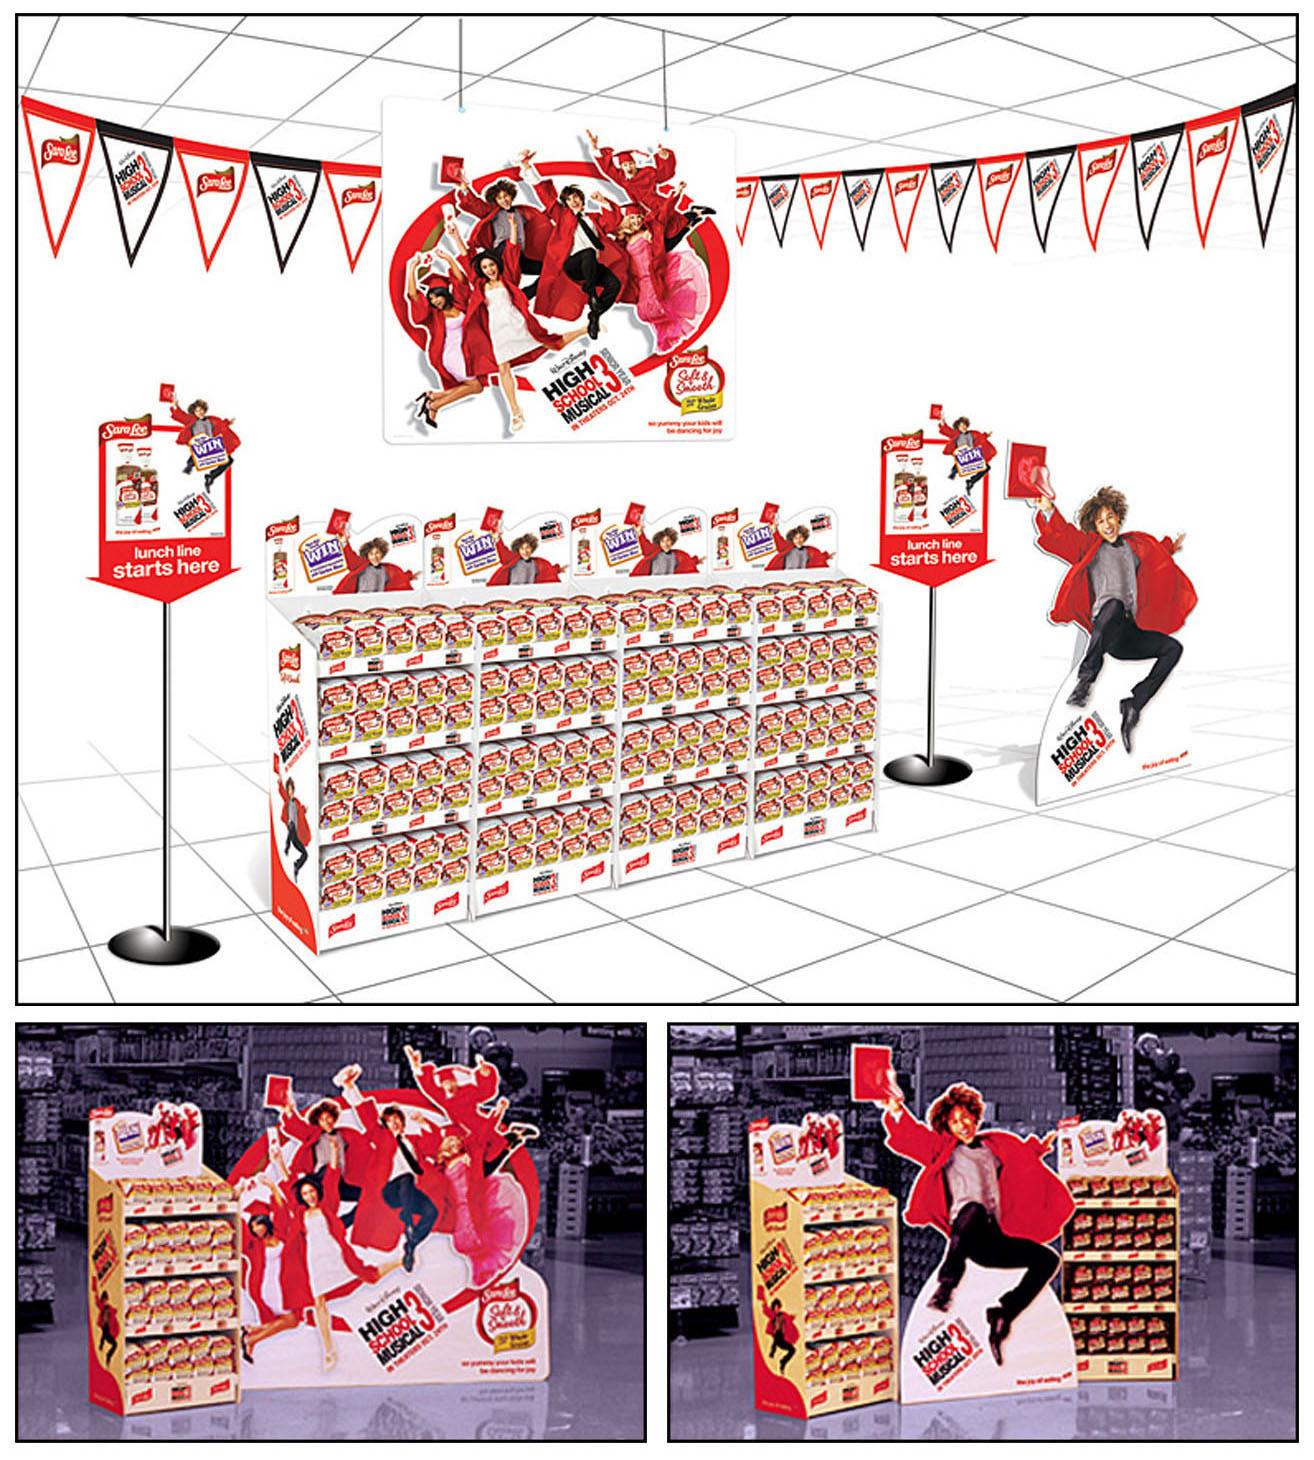 Sara Lee: HSM3 Promotion – Merchandising Displays